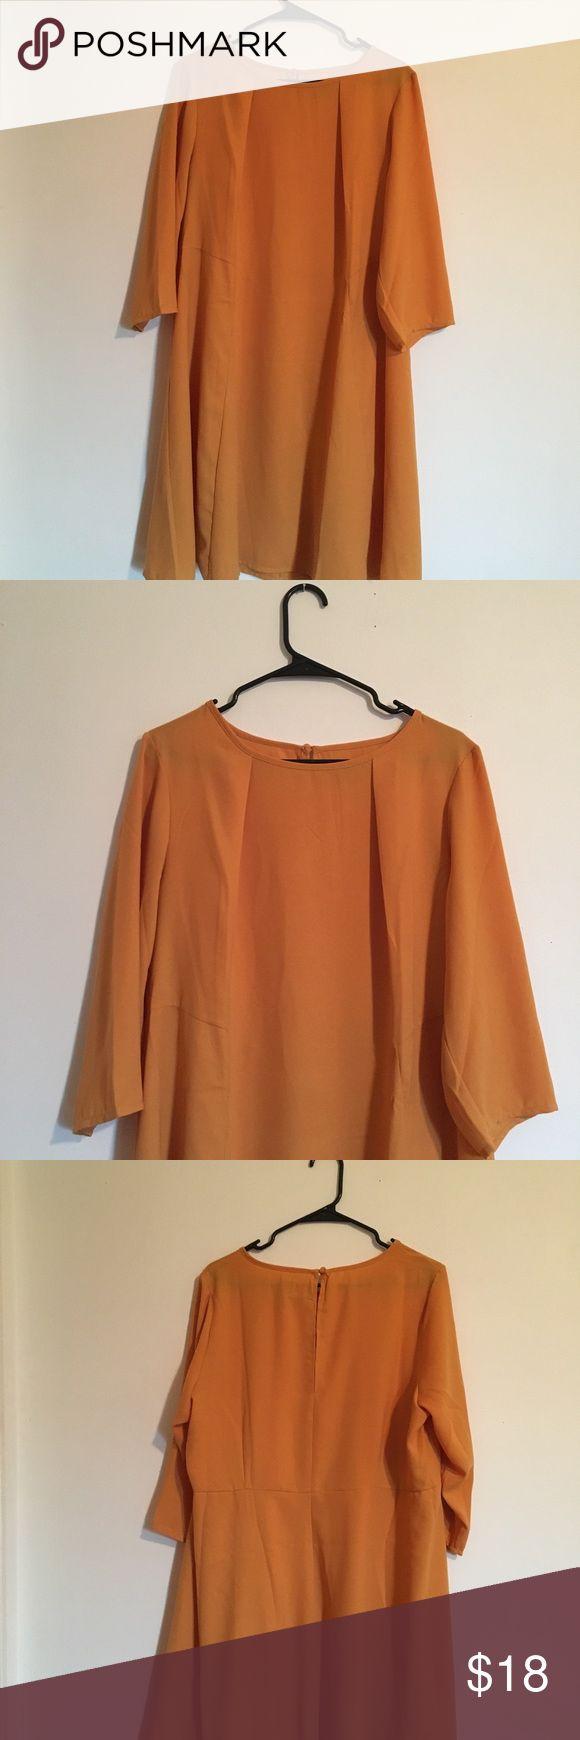 ASOS CURVE Swing Dress Size 18 NEW ASOS CURVE Swing Dress Size 18 ASOS Curve Dresses